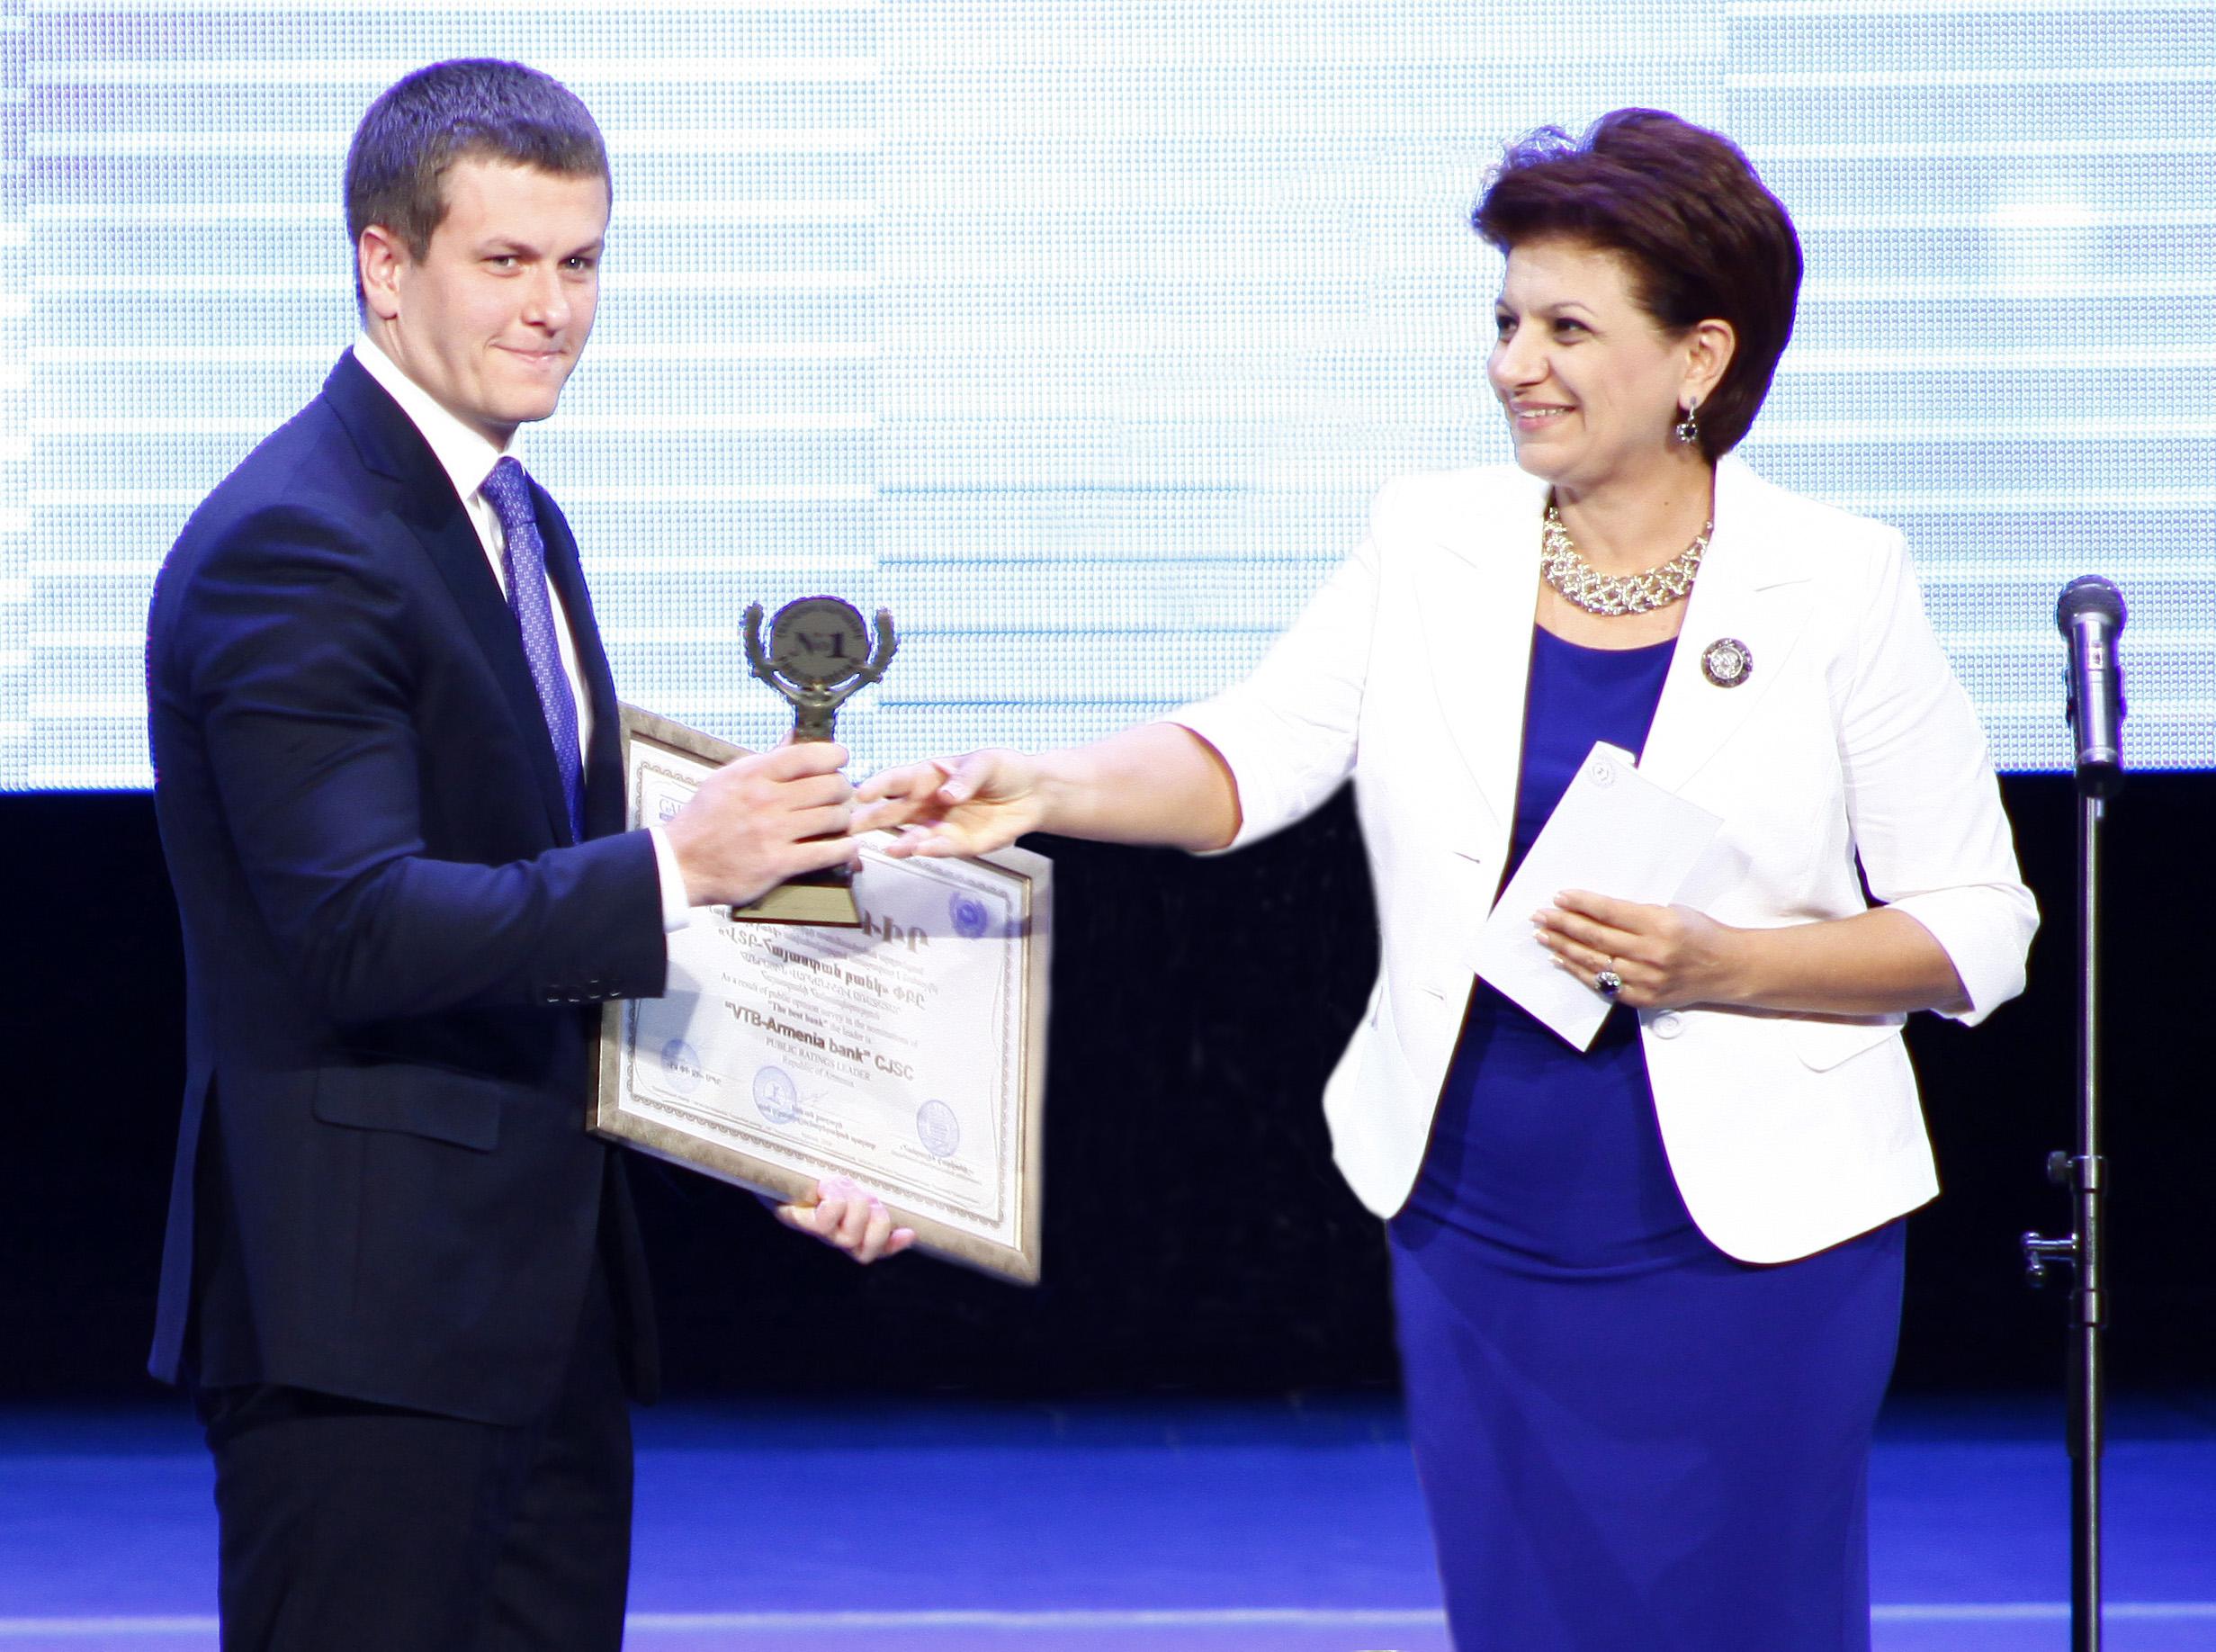 Yuri Gusev, left, of VTB Bank Armenia accepts the